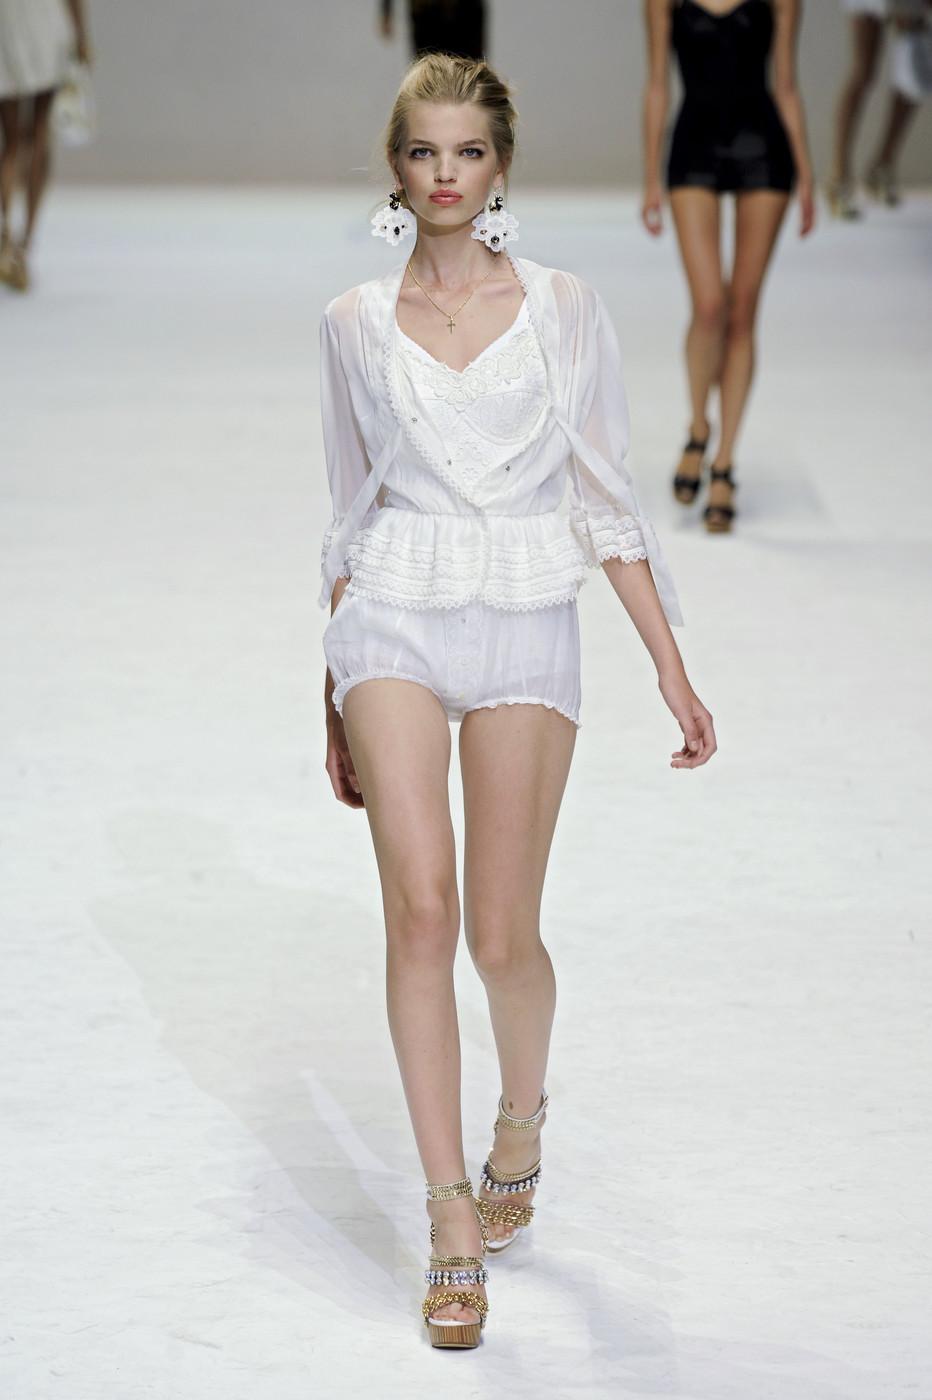 Dolce&Gabbana Spring/Summer 2011